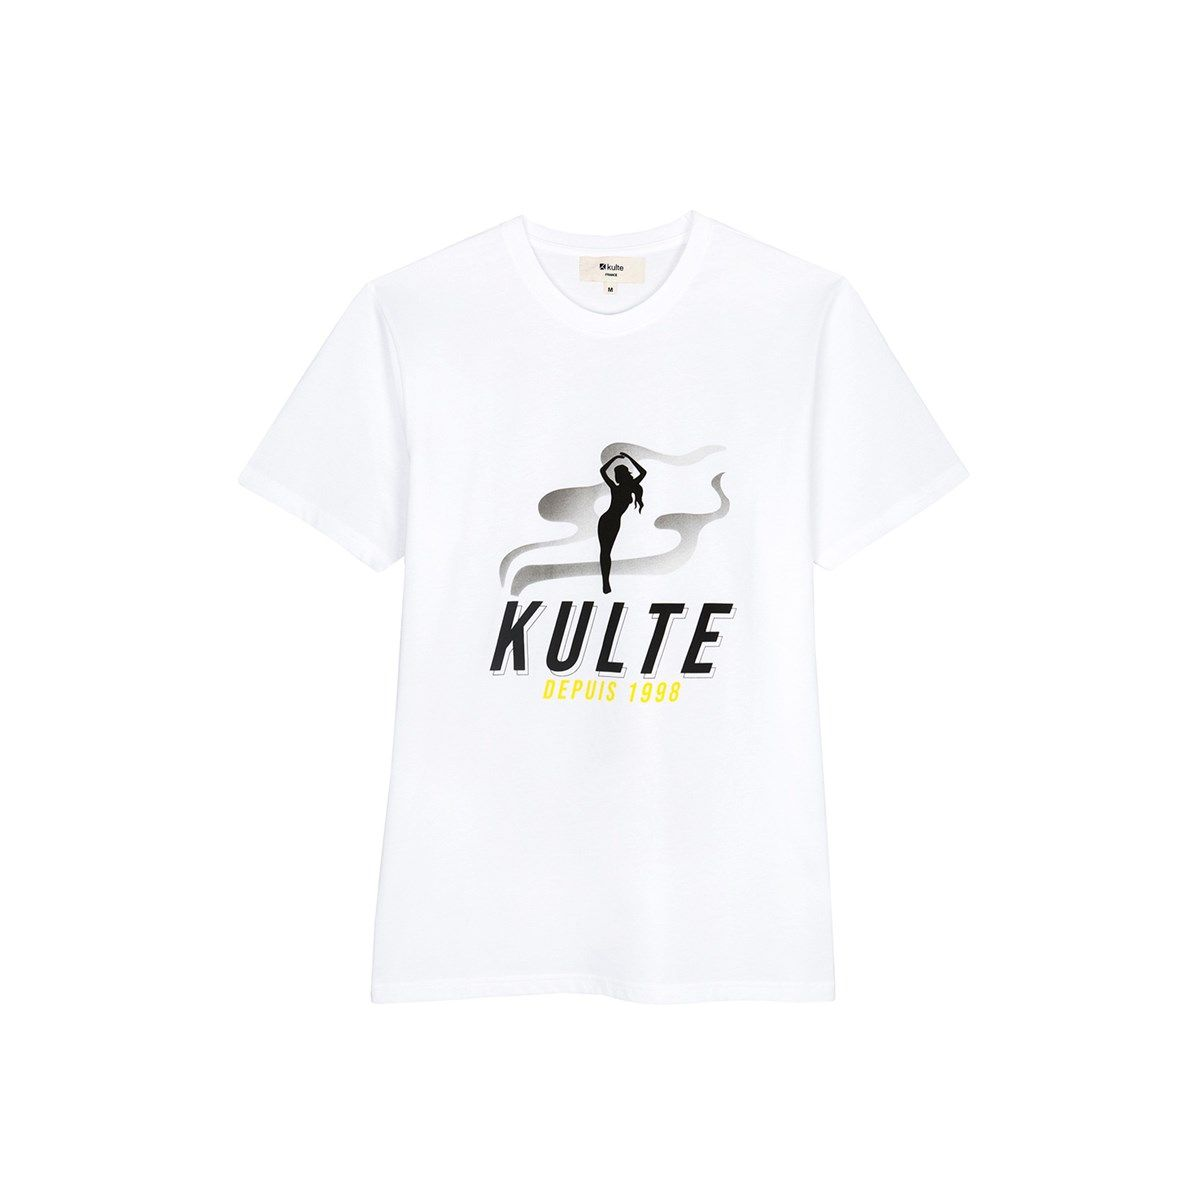 Tee Shirt Gitane Taille : L;M;S;XL;XS | T shirt, Gitane